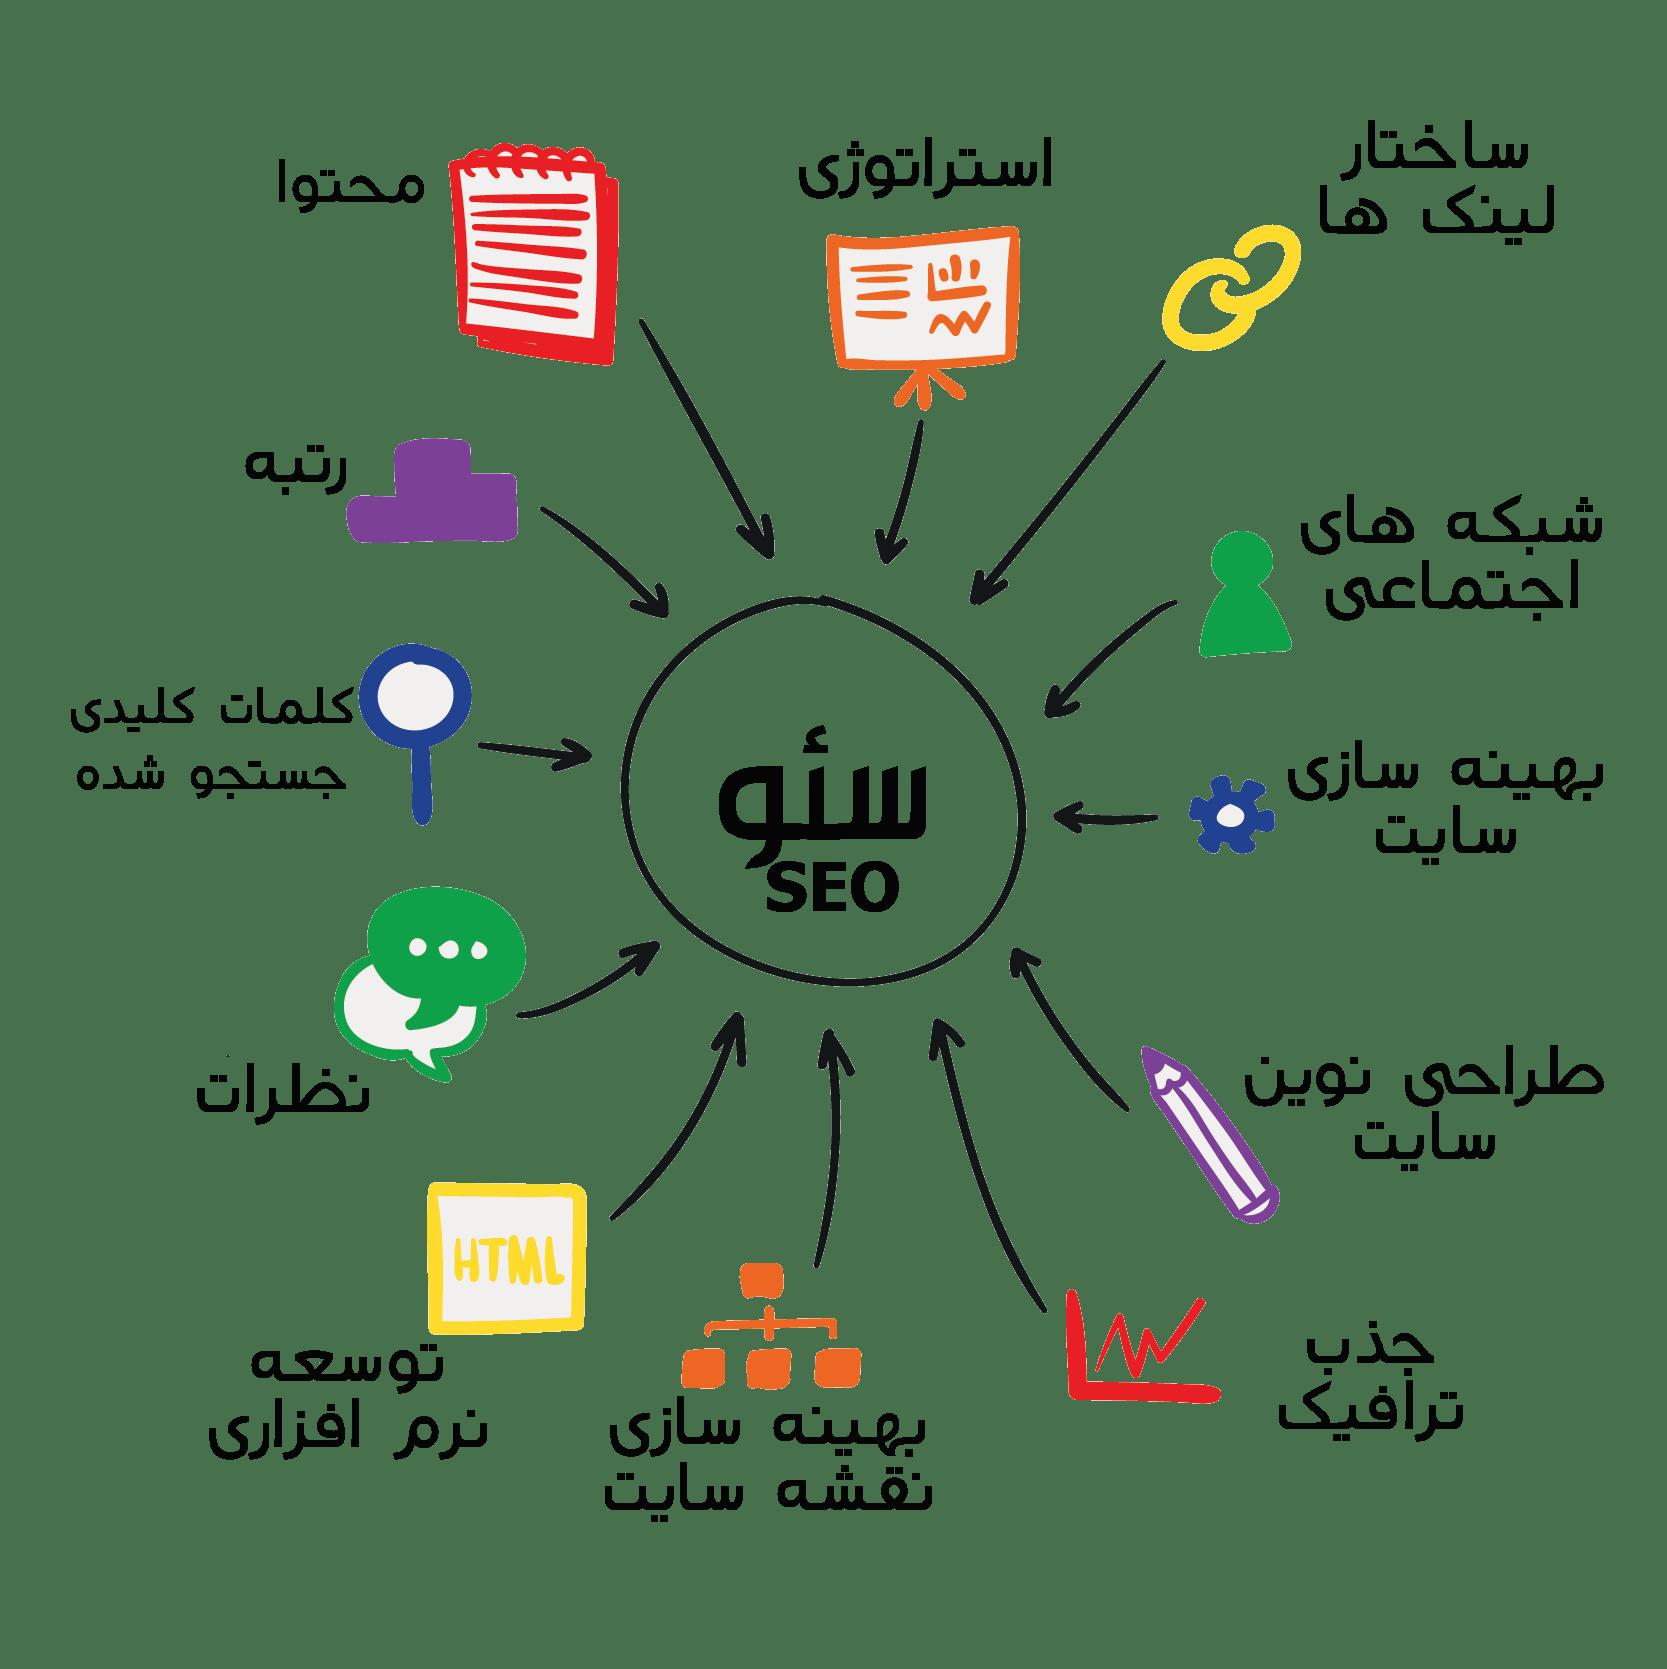 Seo Chart - سئو و بهینه سازی سایت (SEO)